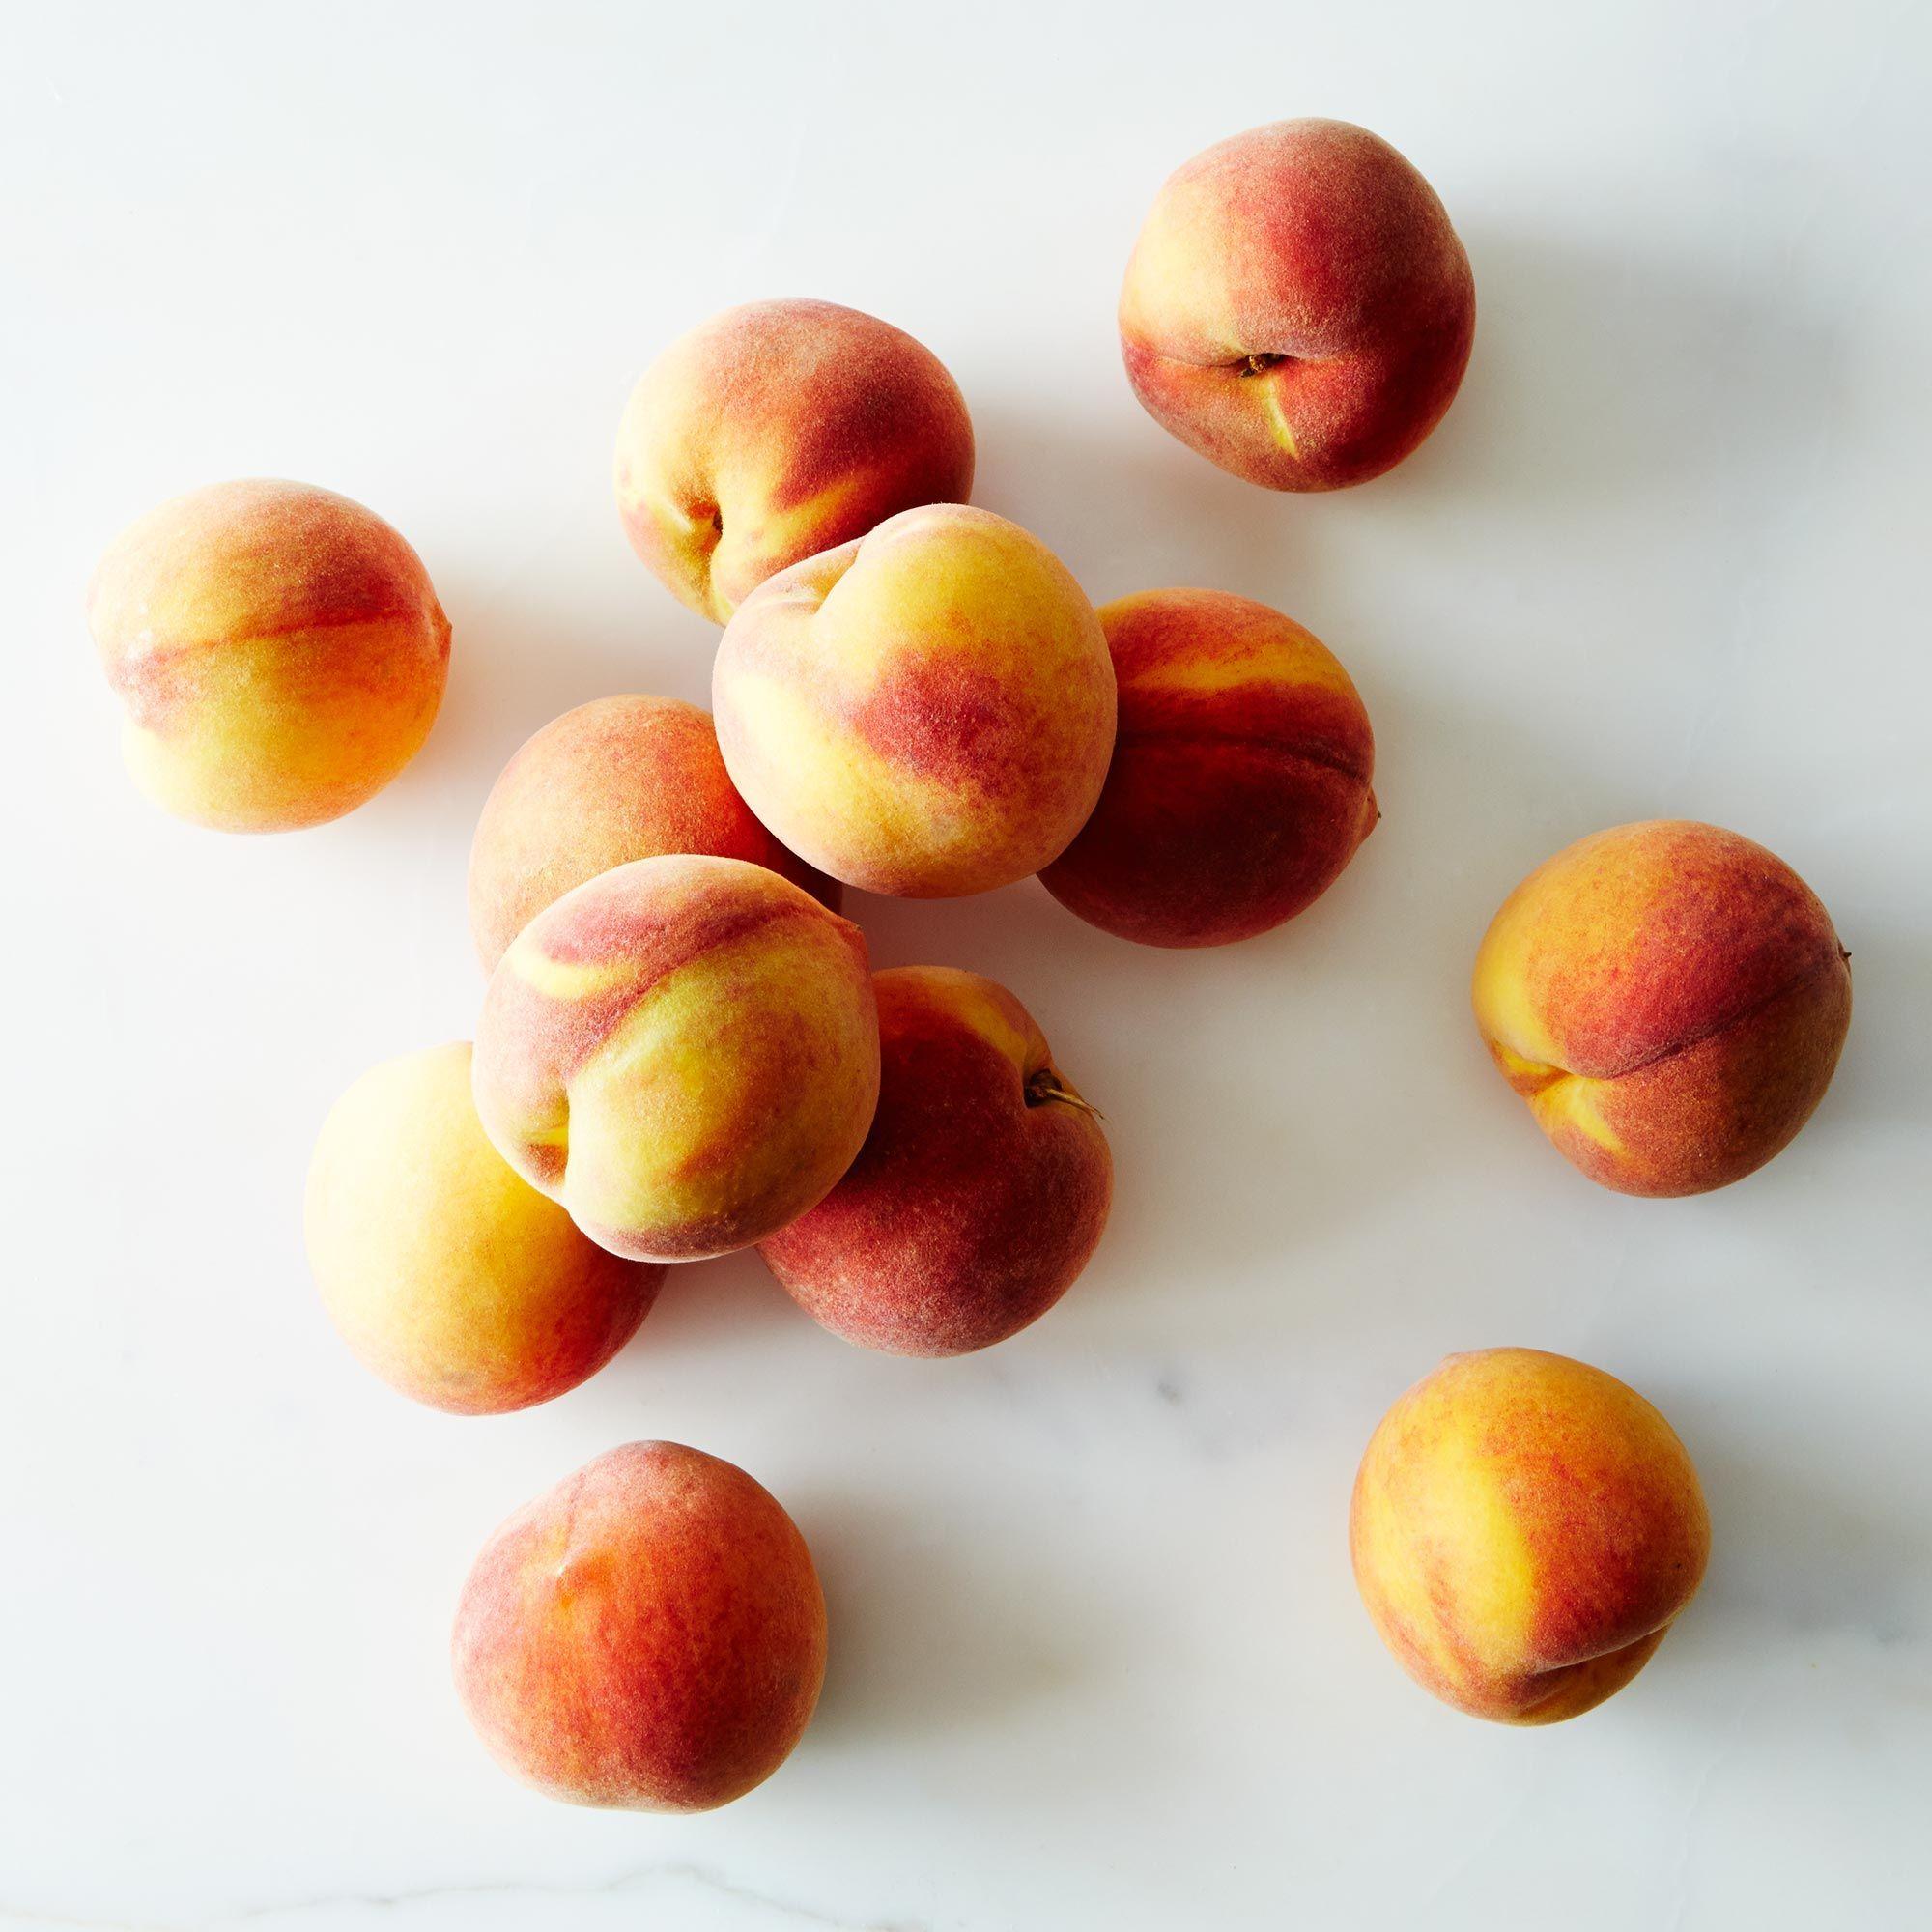 43521ebe a0f6 11e5 a190 0ef7535729df  2014 0625 frog hollow farm organic peaches 5lb 023